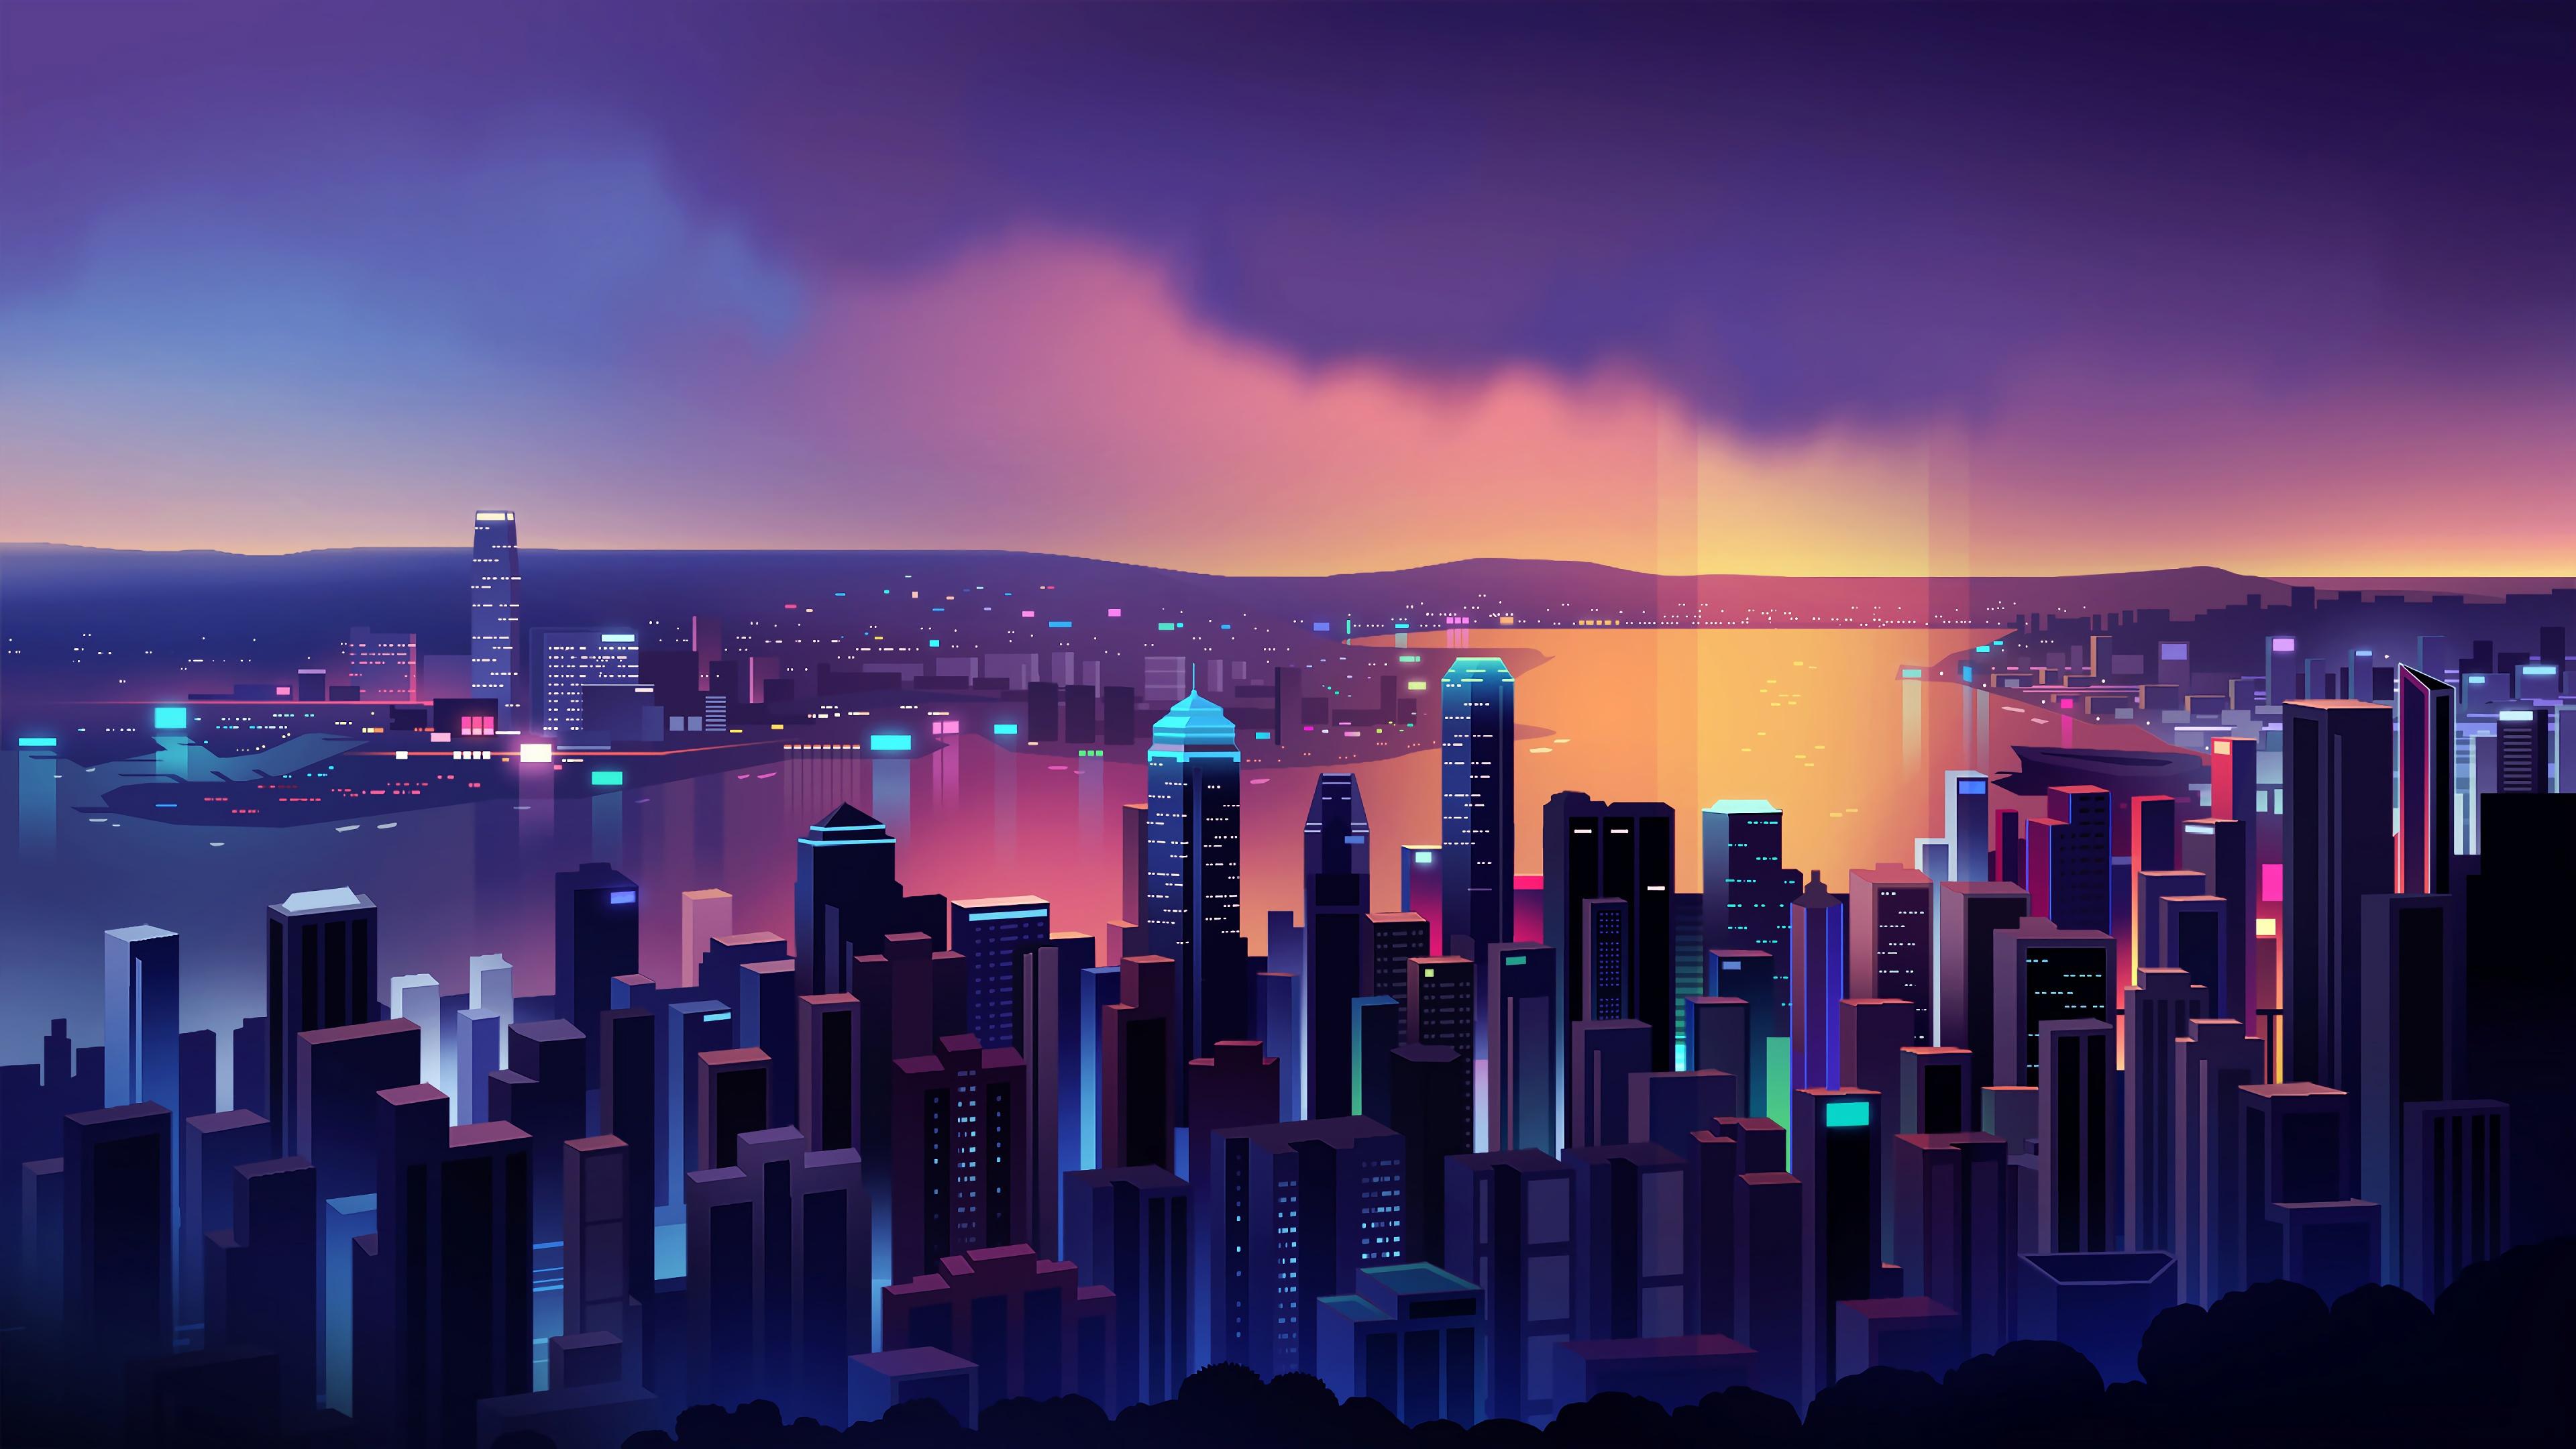 Neon City 4k Ultra Hd Wallpaper Background Image 3840x2160 Id 1063352 Wallpaper Abyss